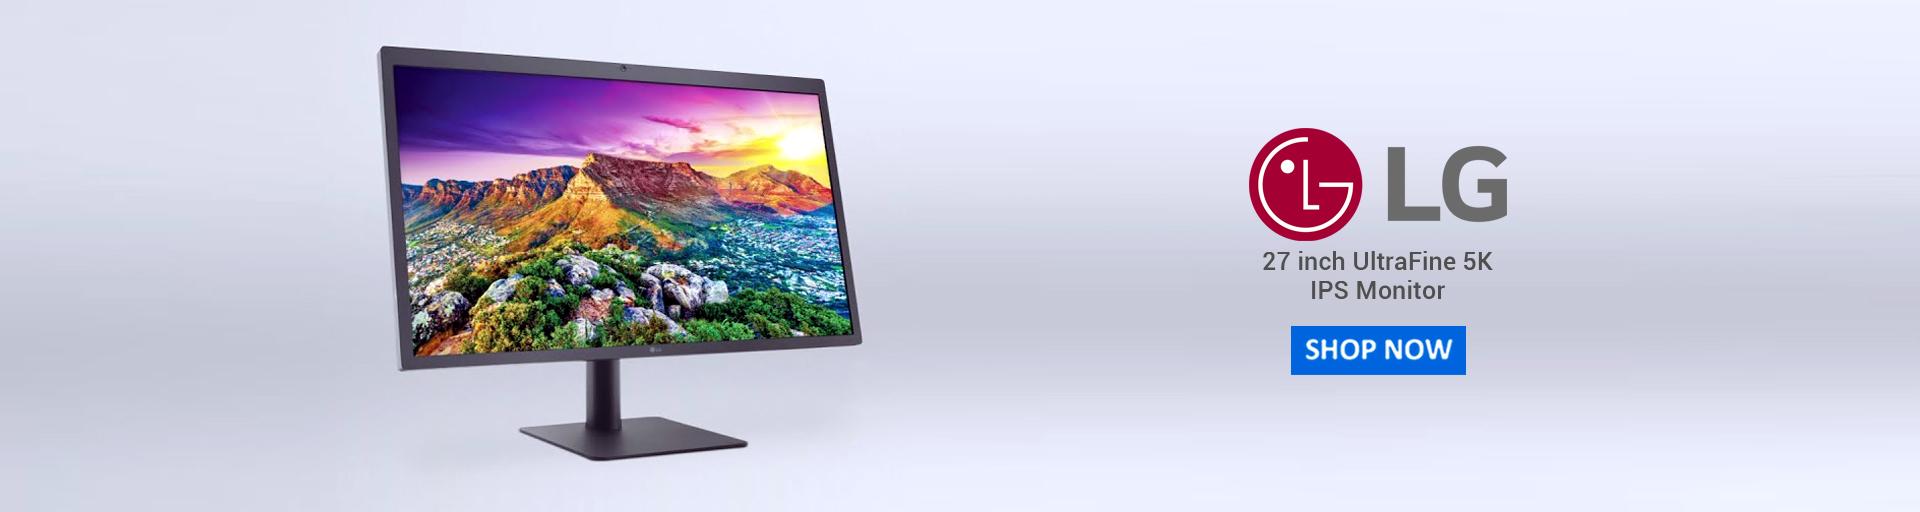 LG 27 inch UltraFine 5K IPS Monitor